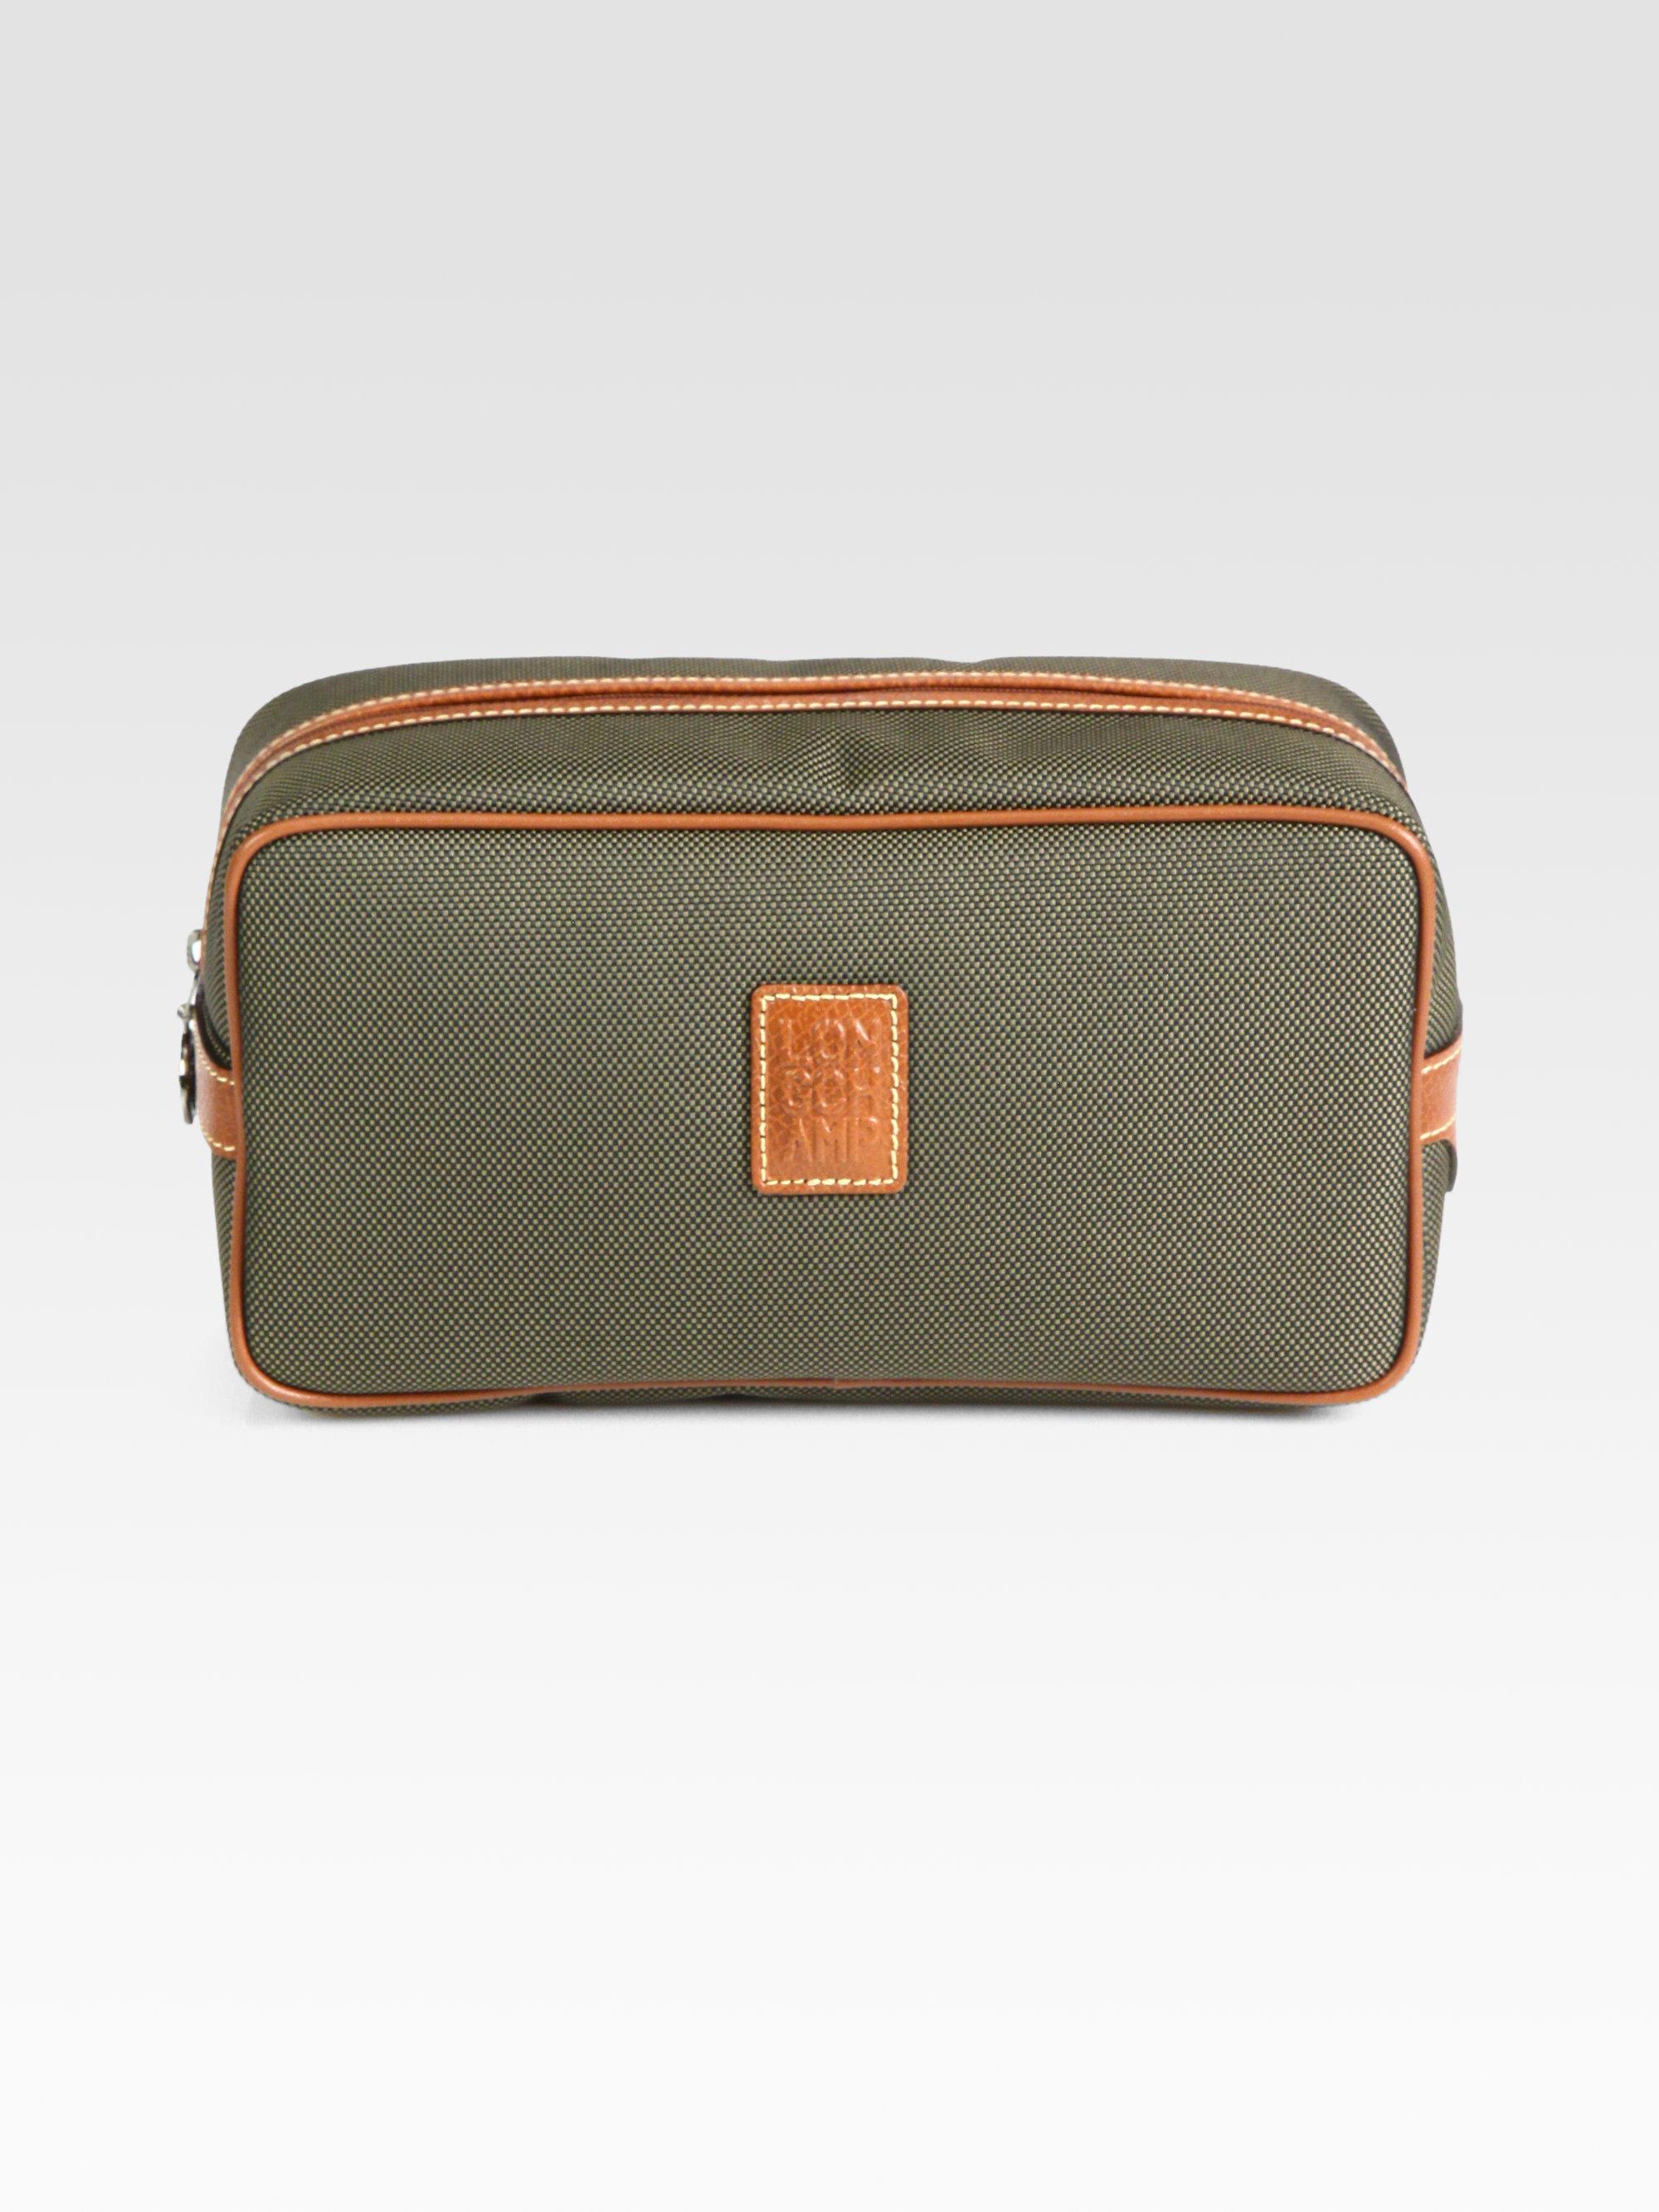 Longchamp Boxford Travel Bag Australia  2acd6819bcef8